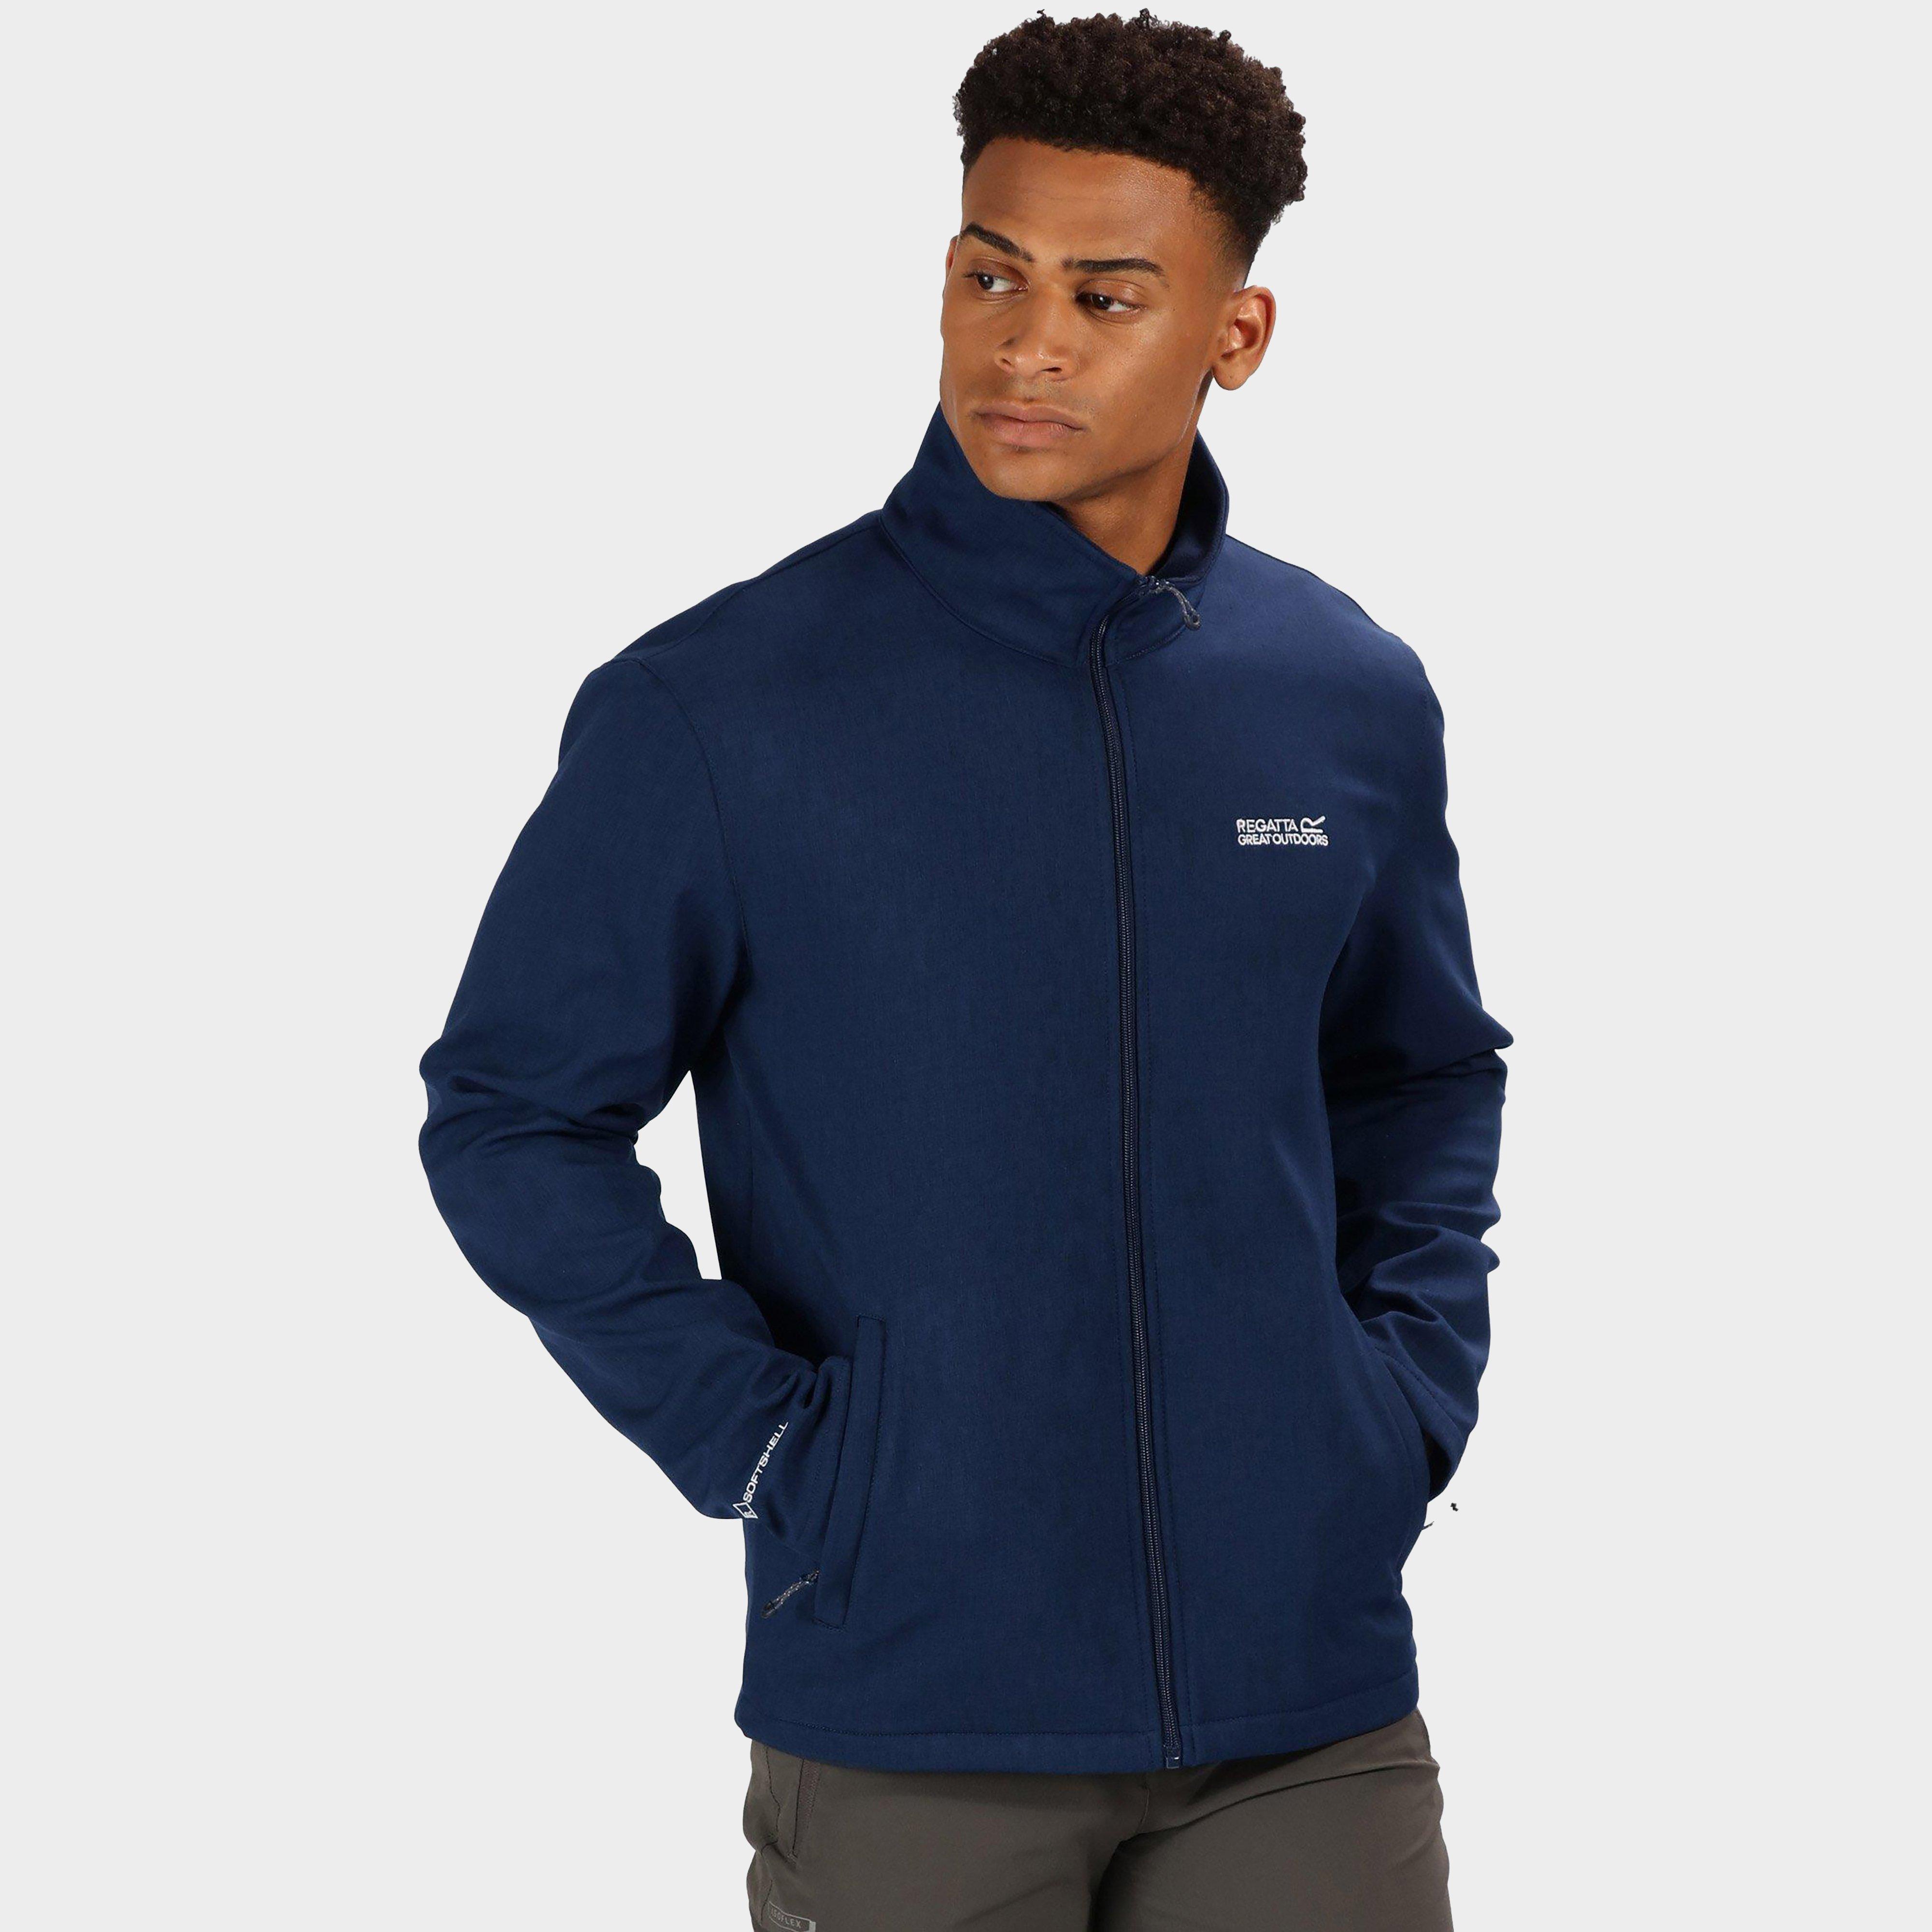 Regatta Men's Carby Softshell Jacket - Blue/Jacket, Blue